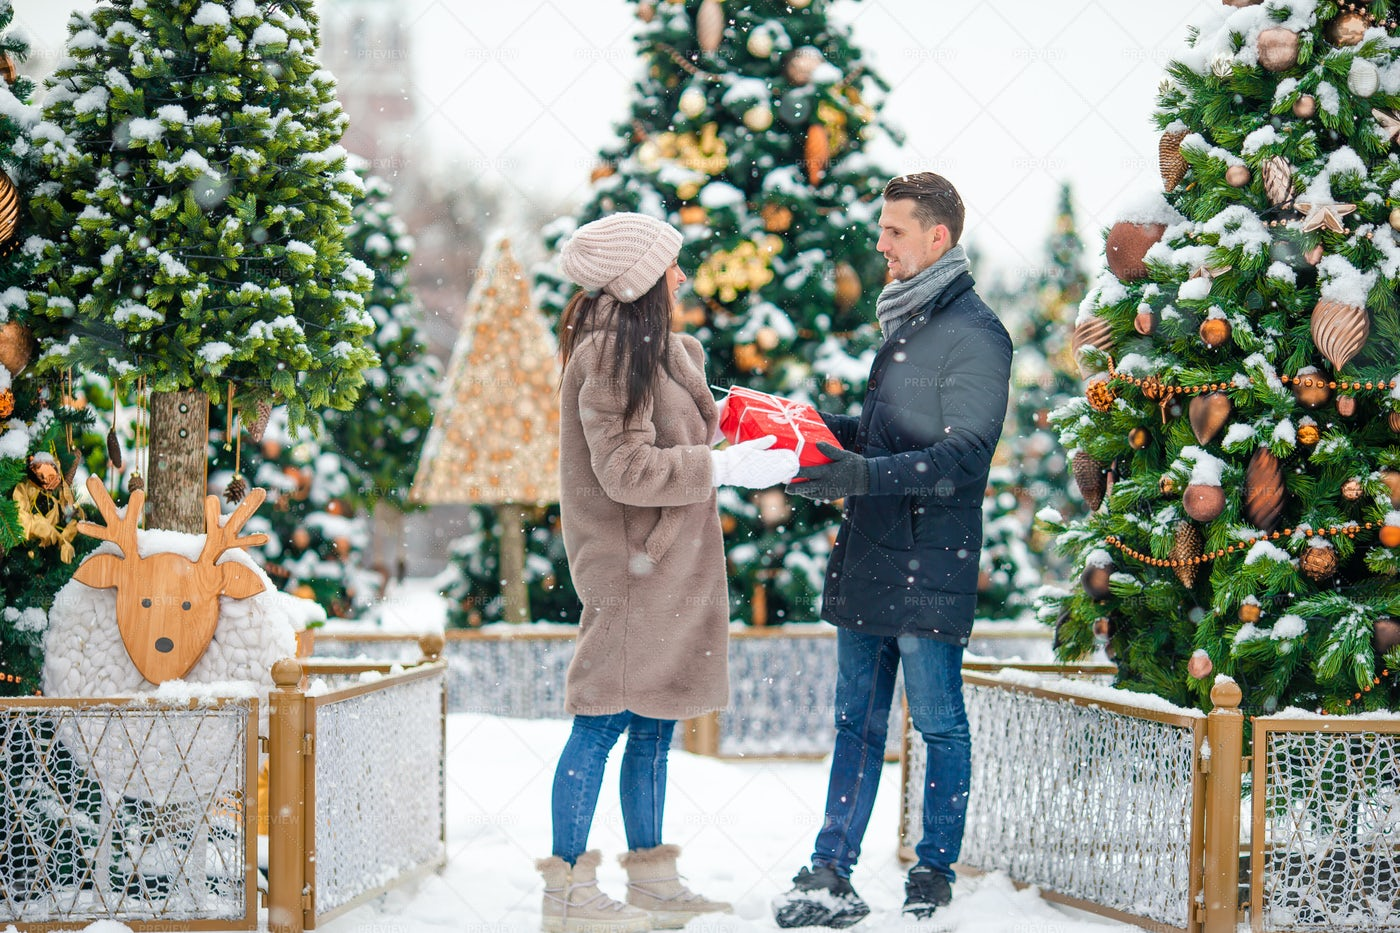 Couple With Christmas Gift: Stock Photos